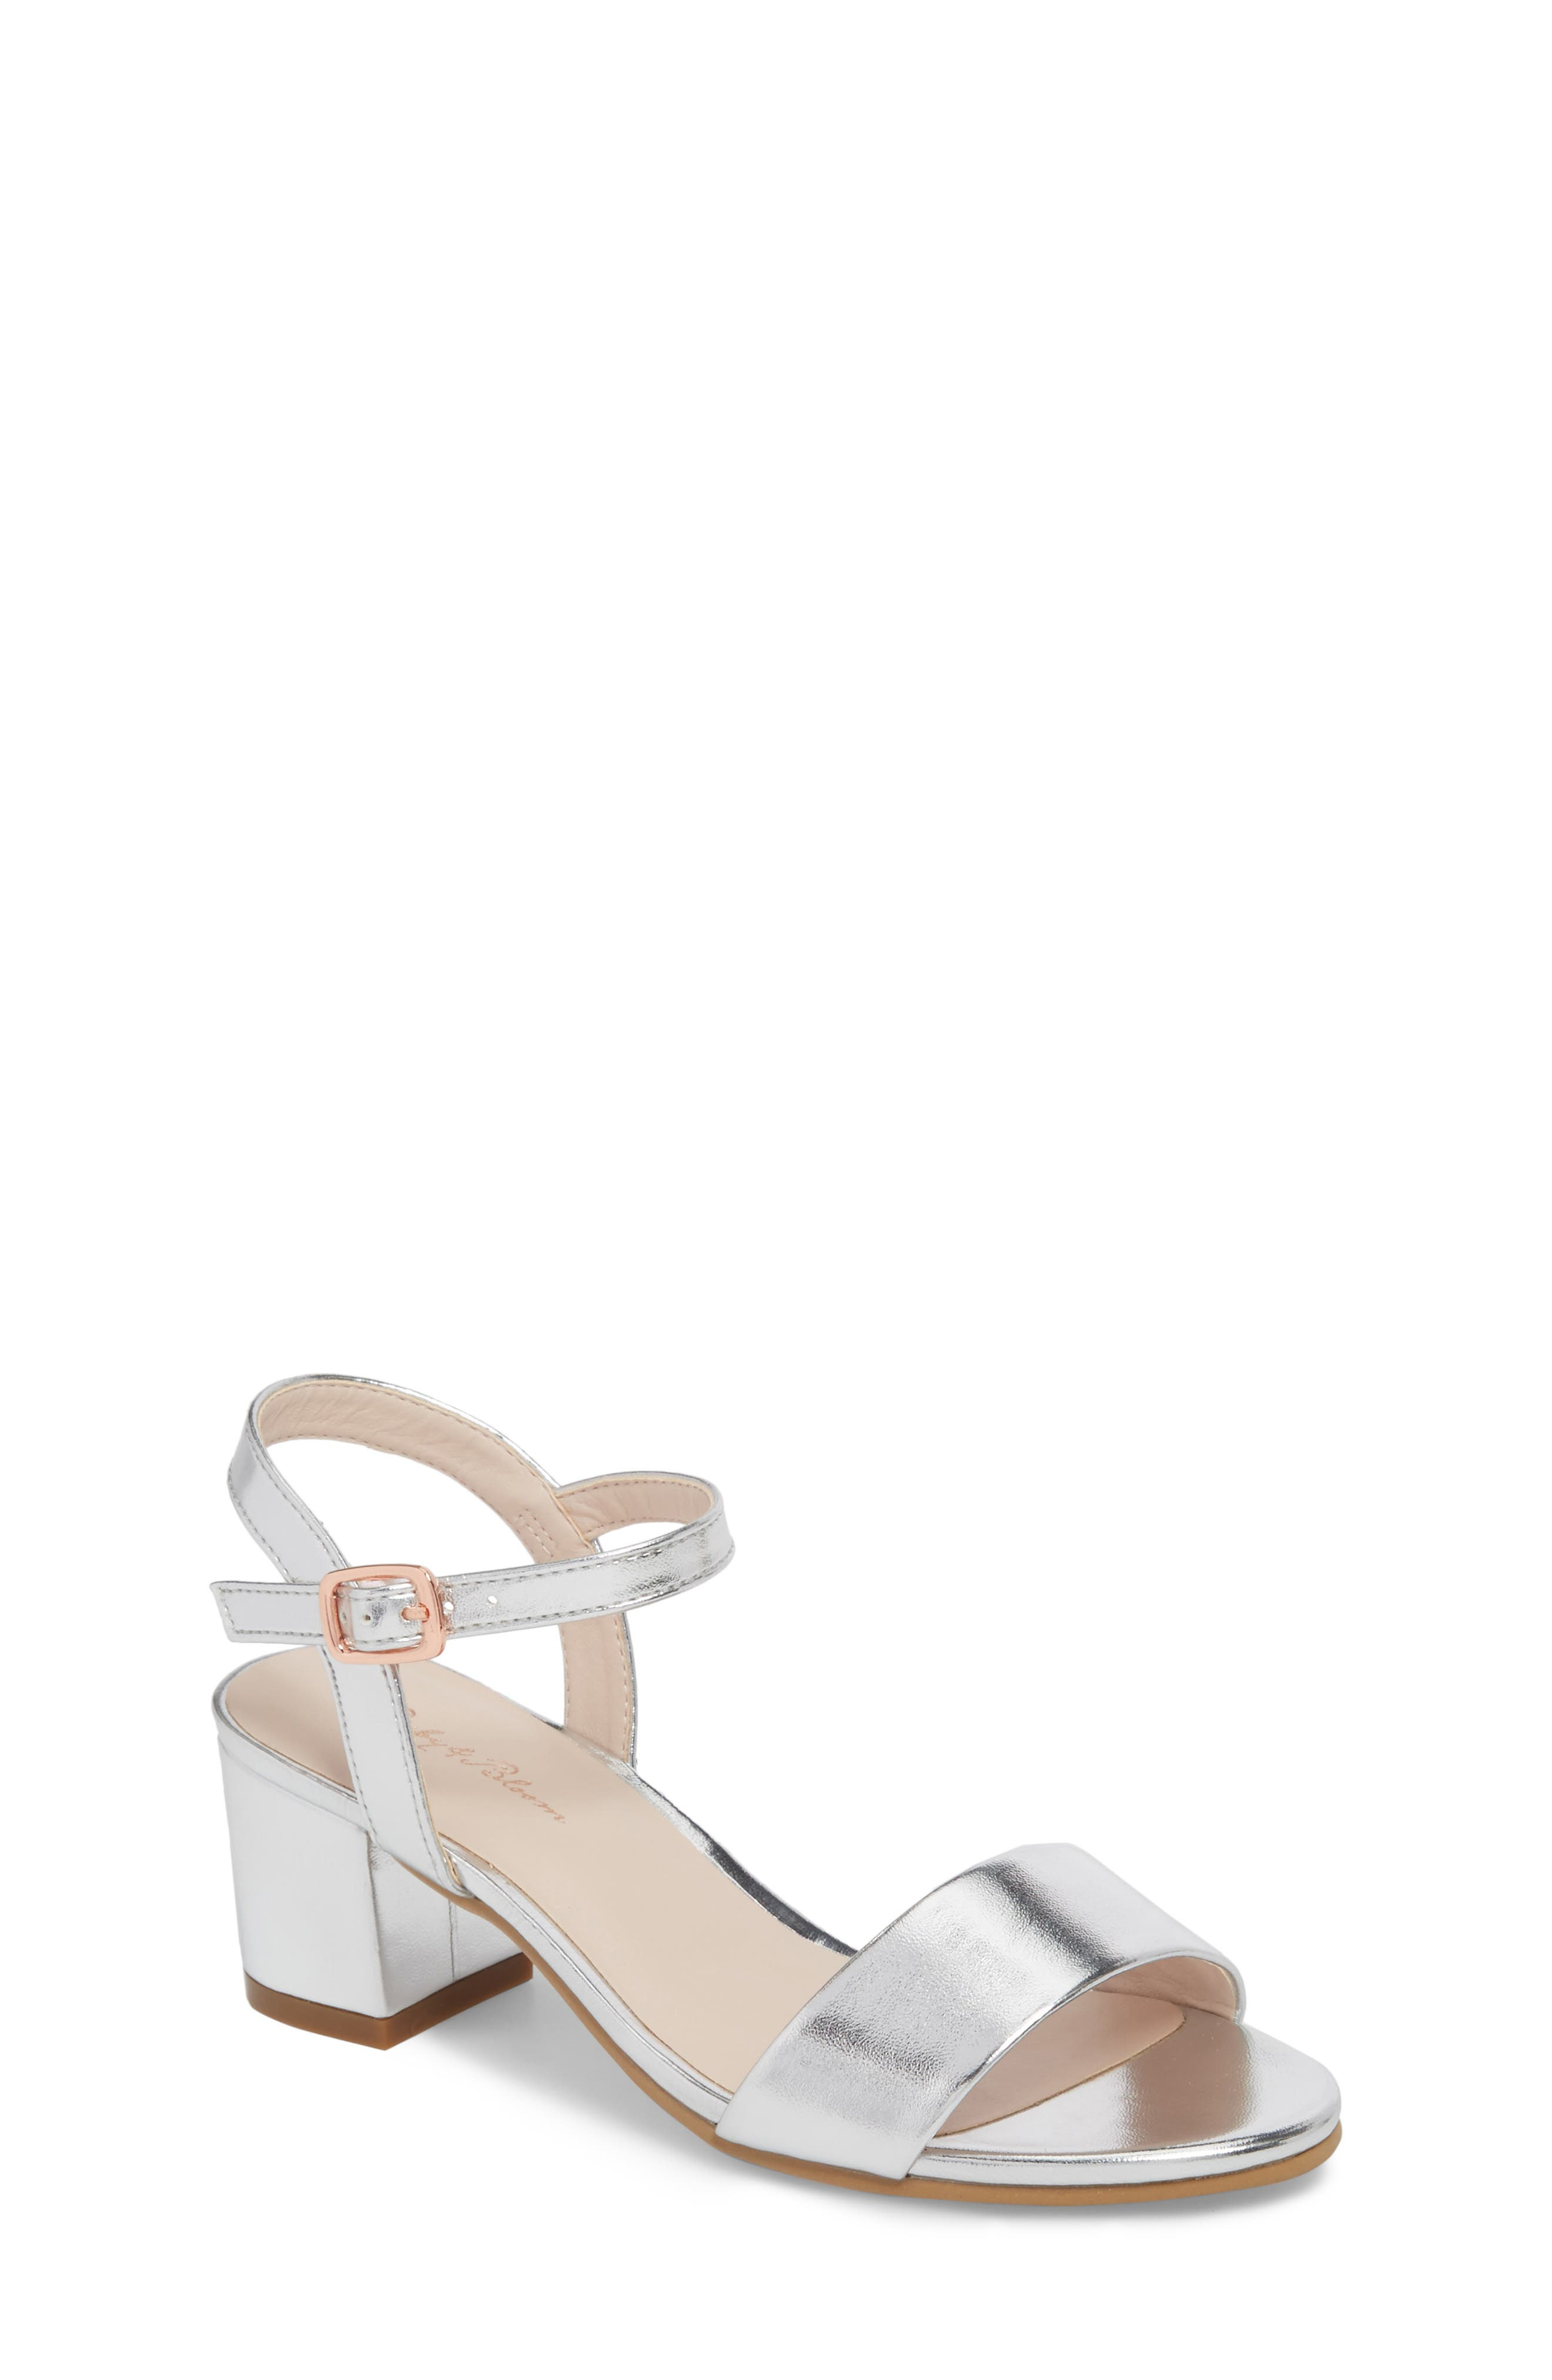 Danni Block Heel Sandal,                             Main thumbnail 1, color,                             Silver Faux Leather